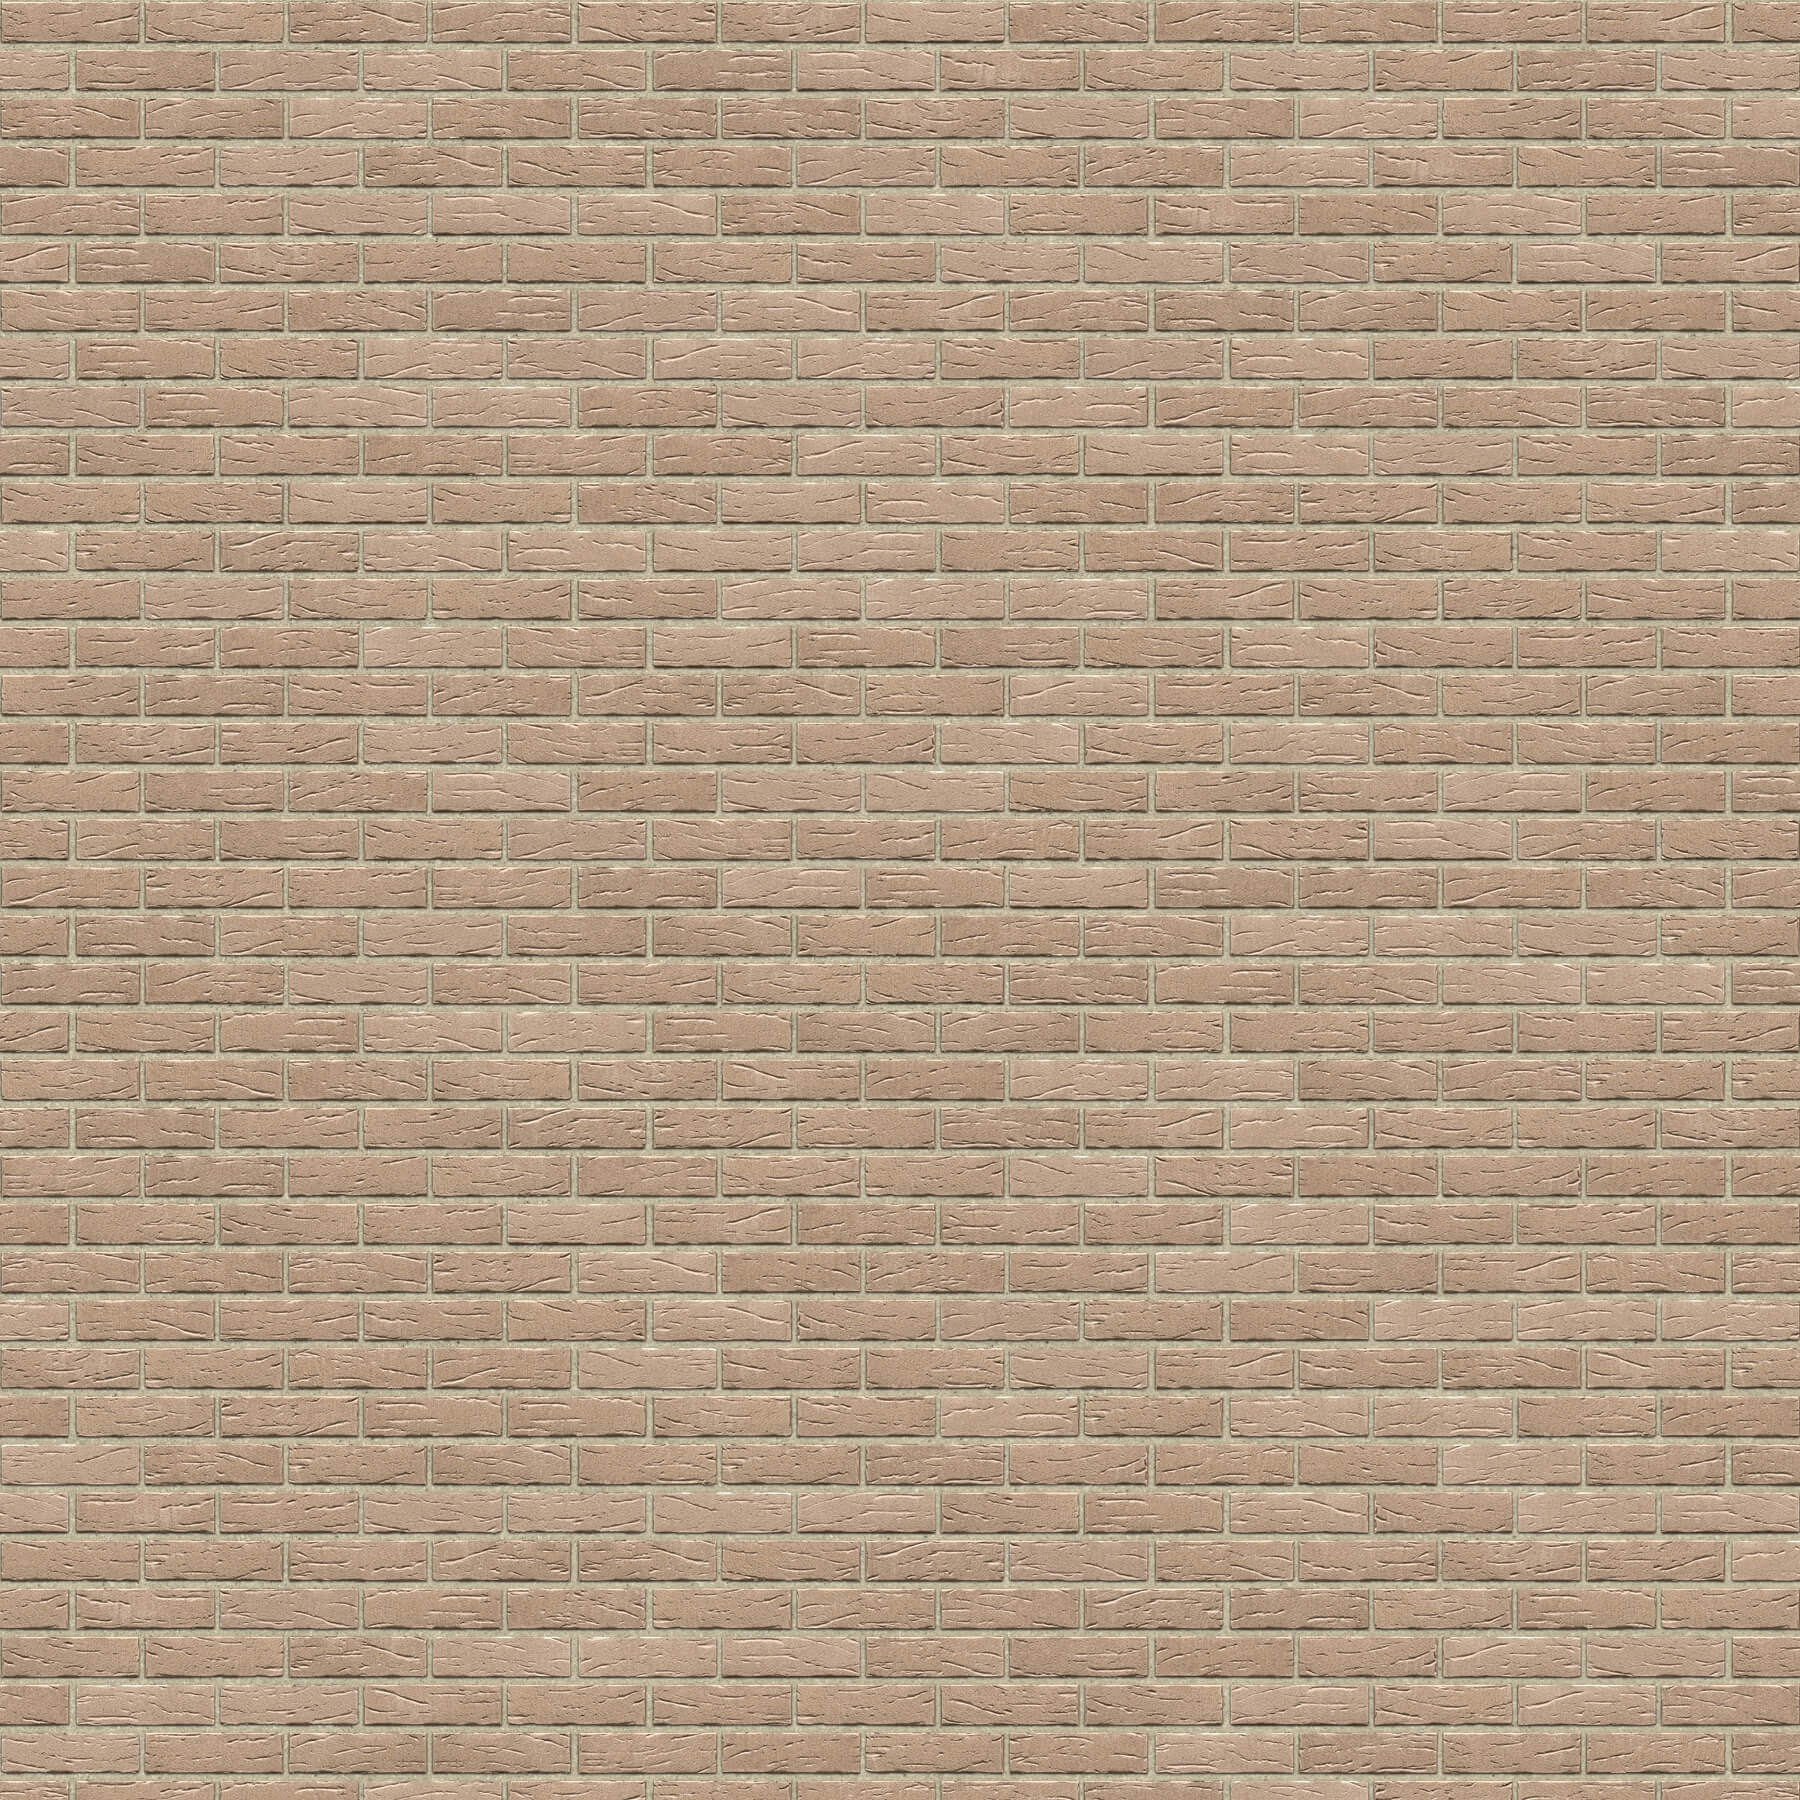 Dekorativna cigla listela FeldHaus Klinker r-680 nf Bez fuga